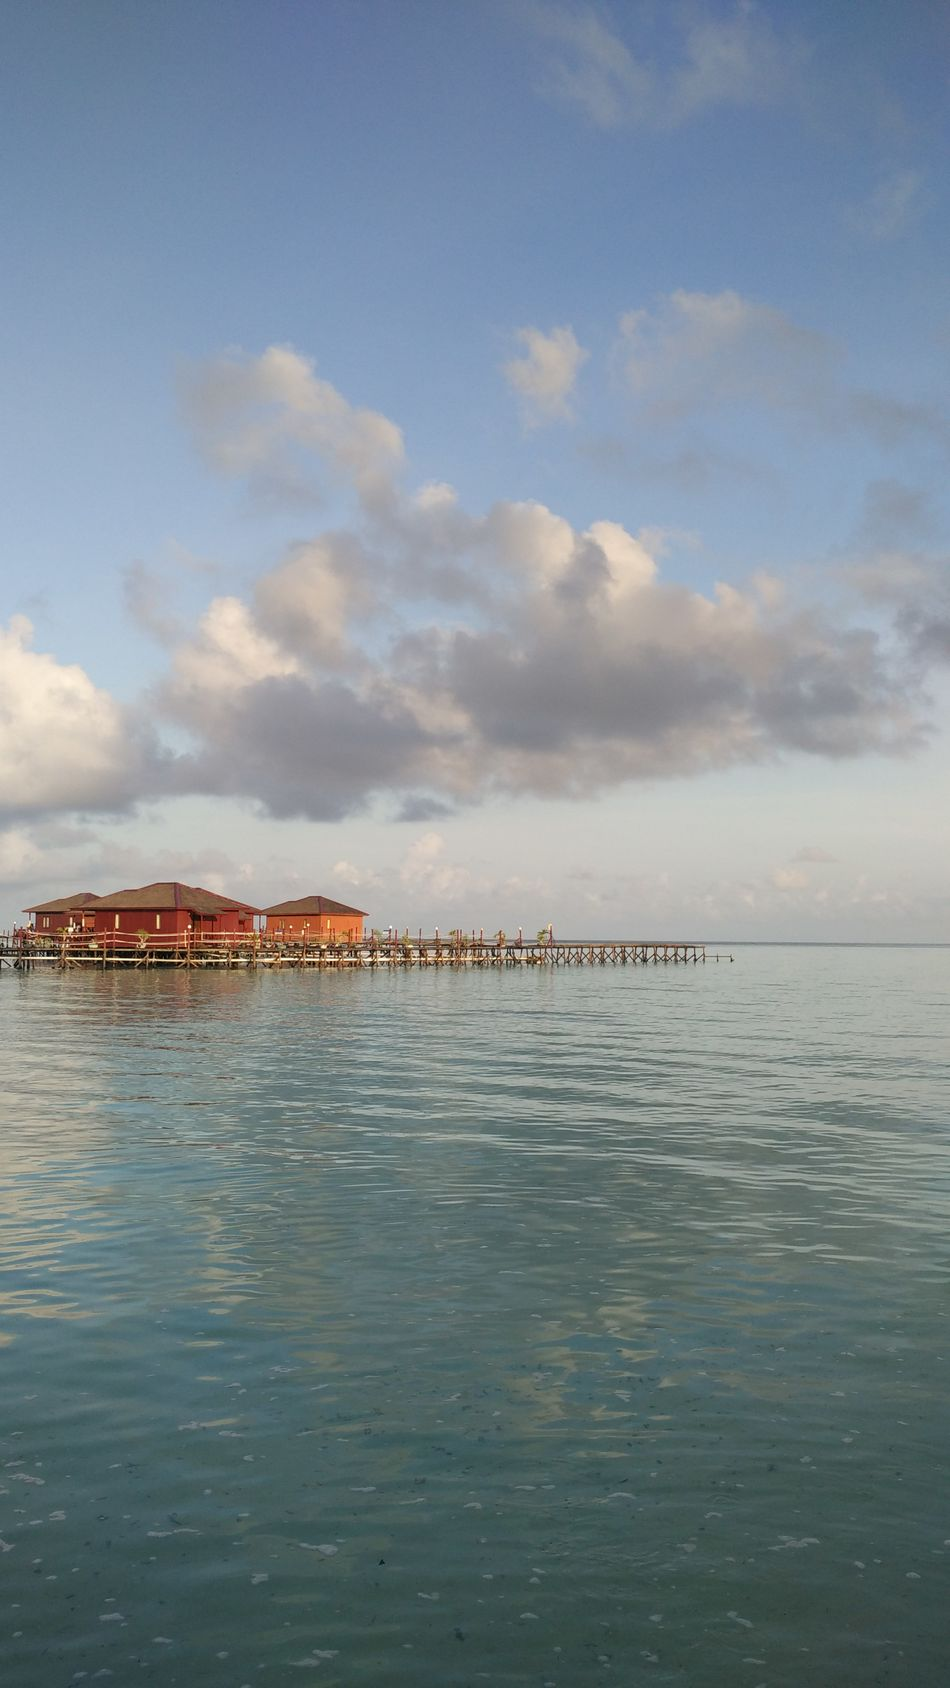 Maratua Paradise Resort Derawanisland  Maratua Island Kalimantan INDONESIA Holiday First Eyeem Photo